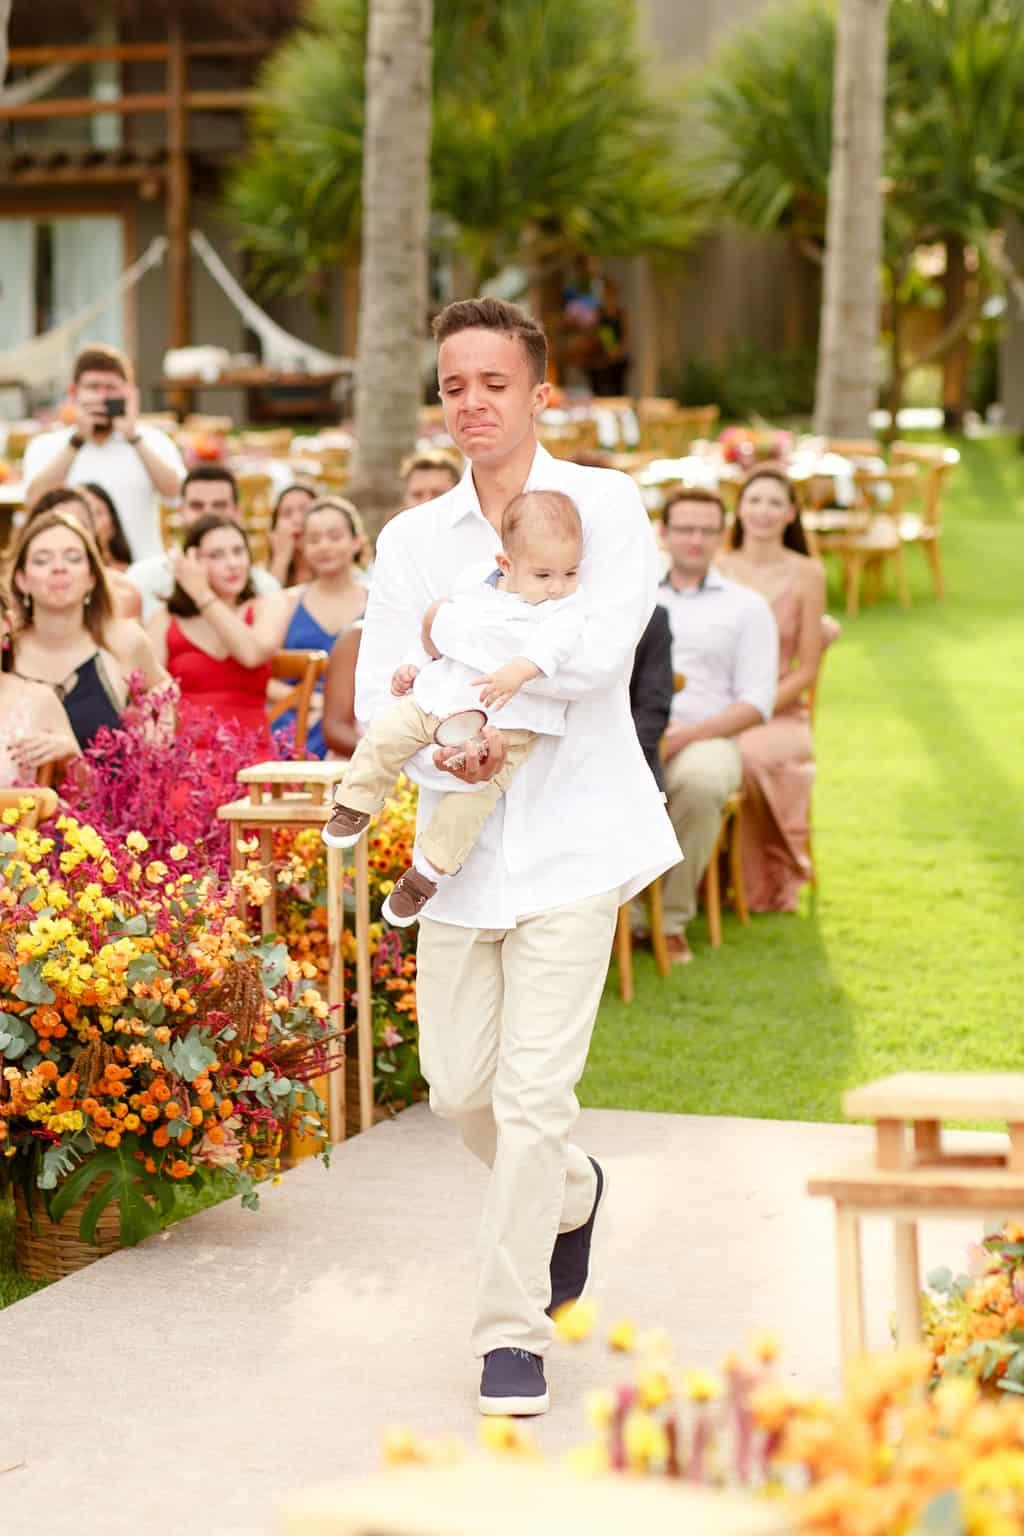 Casamento-Emanuelle-e-Alysson-Fotografia-Tadeu-Nanó-e-Luca-Antunes102